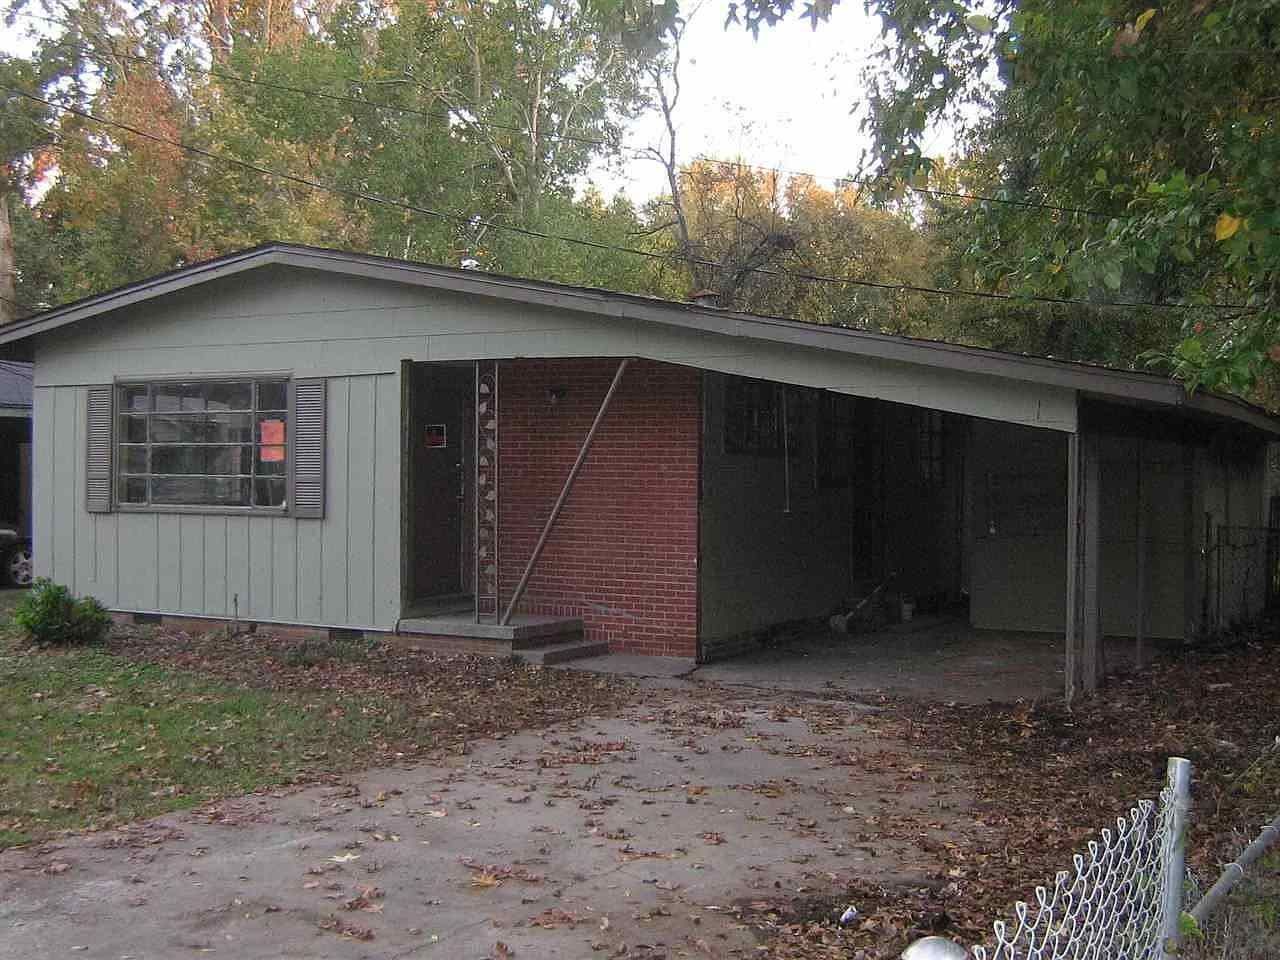 887 CRAWFORD ST, Jackson, MS 39203 - MLS#: 340788